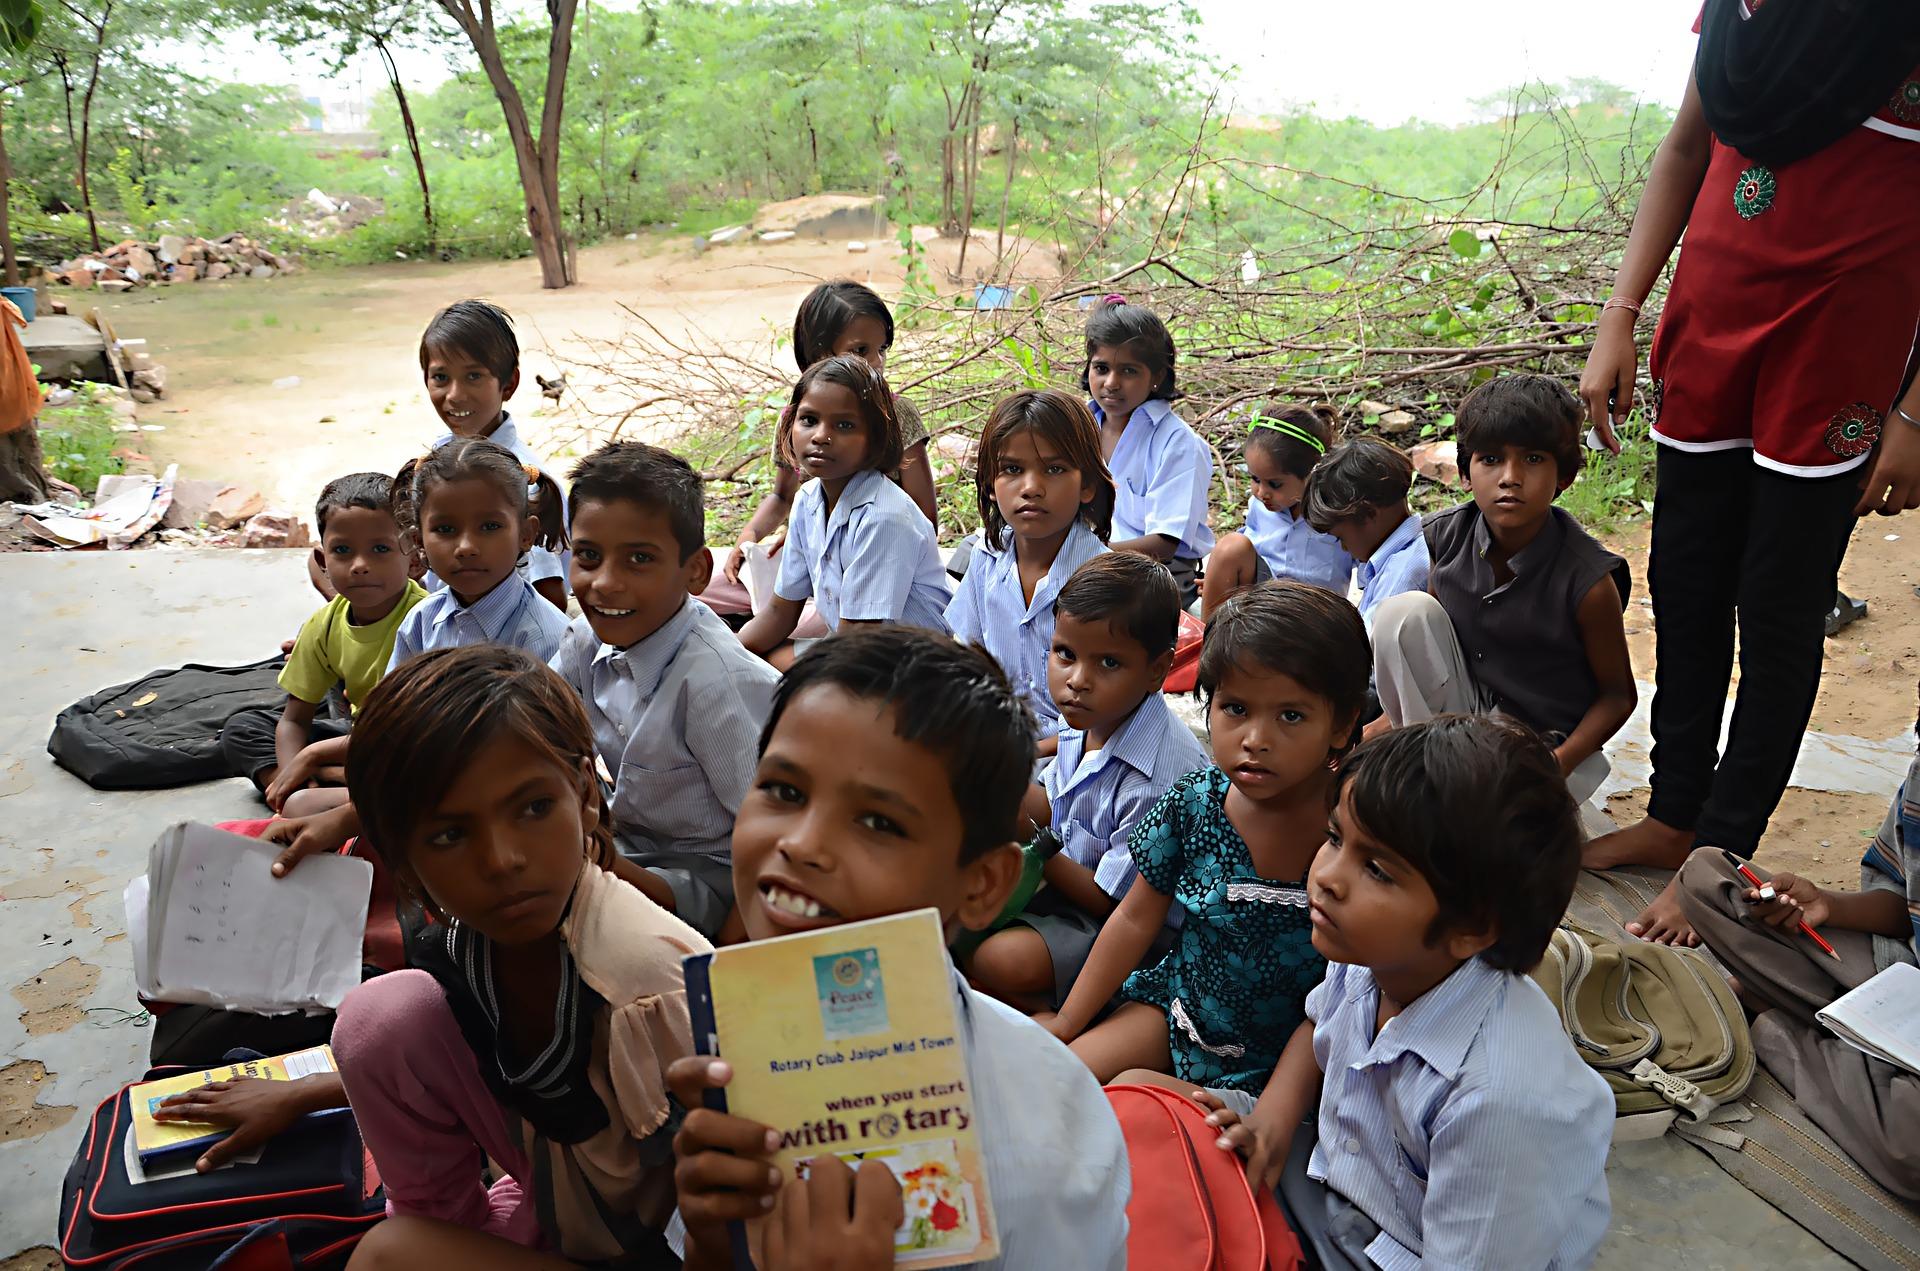 volunteering school expeditions asia